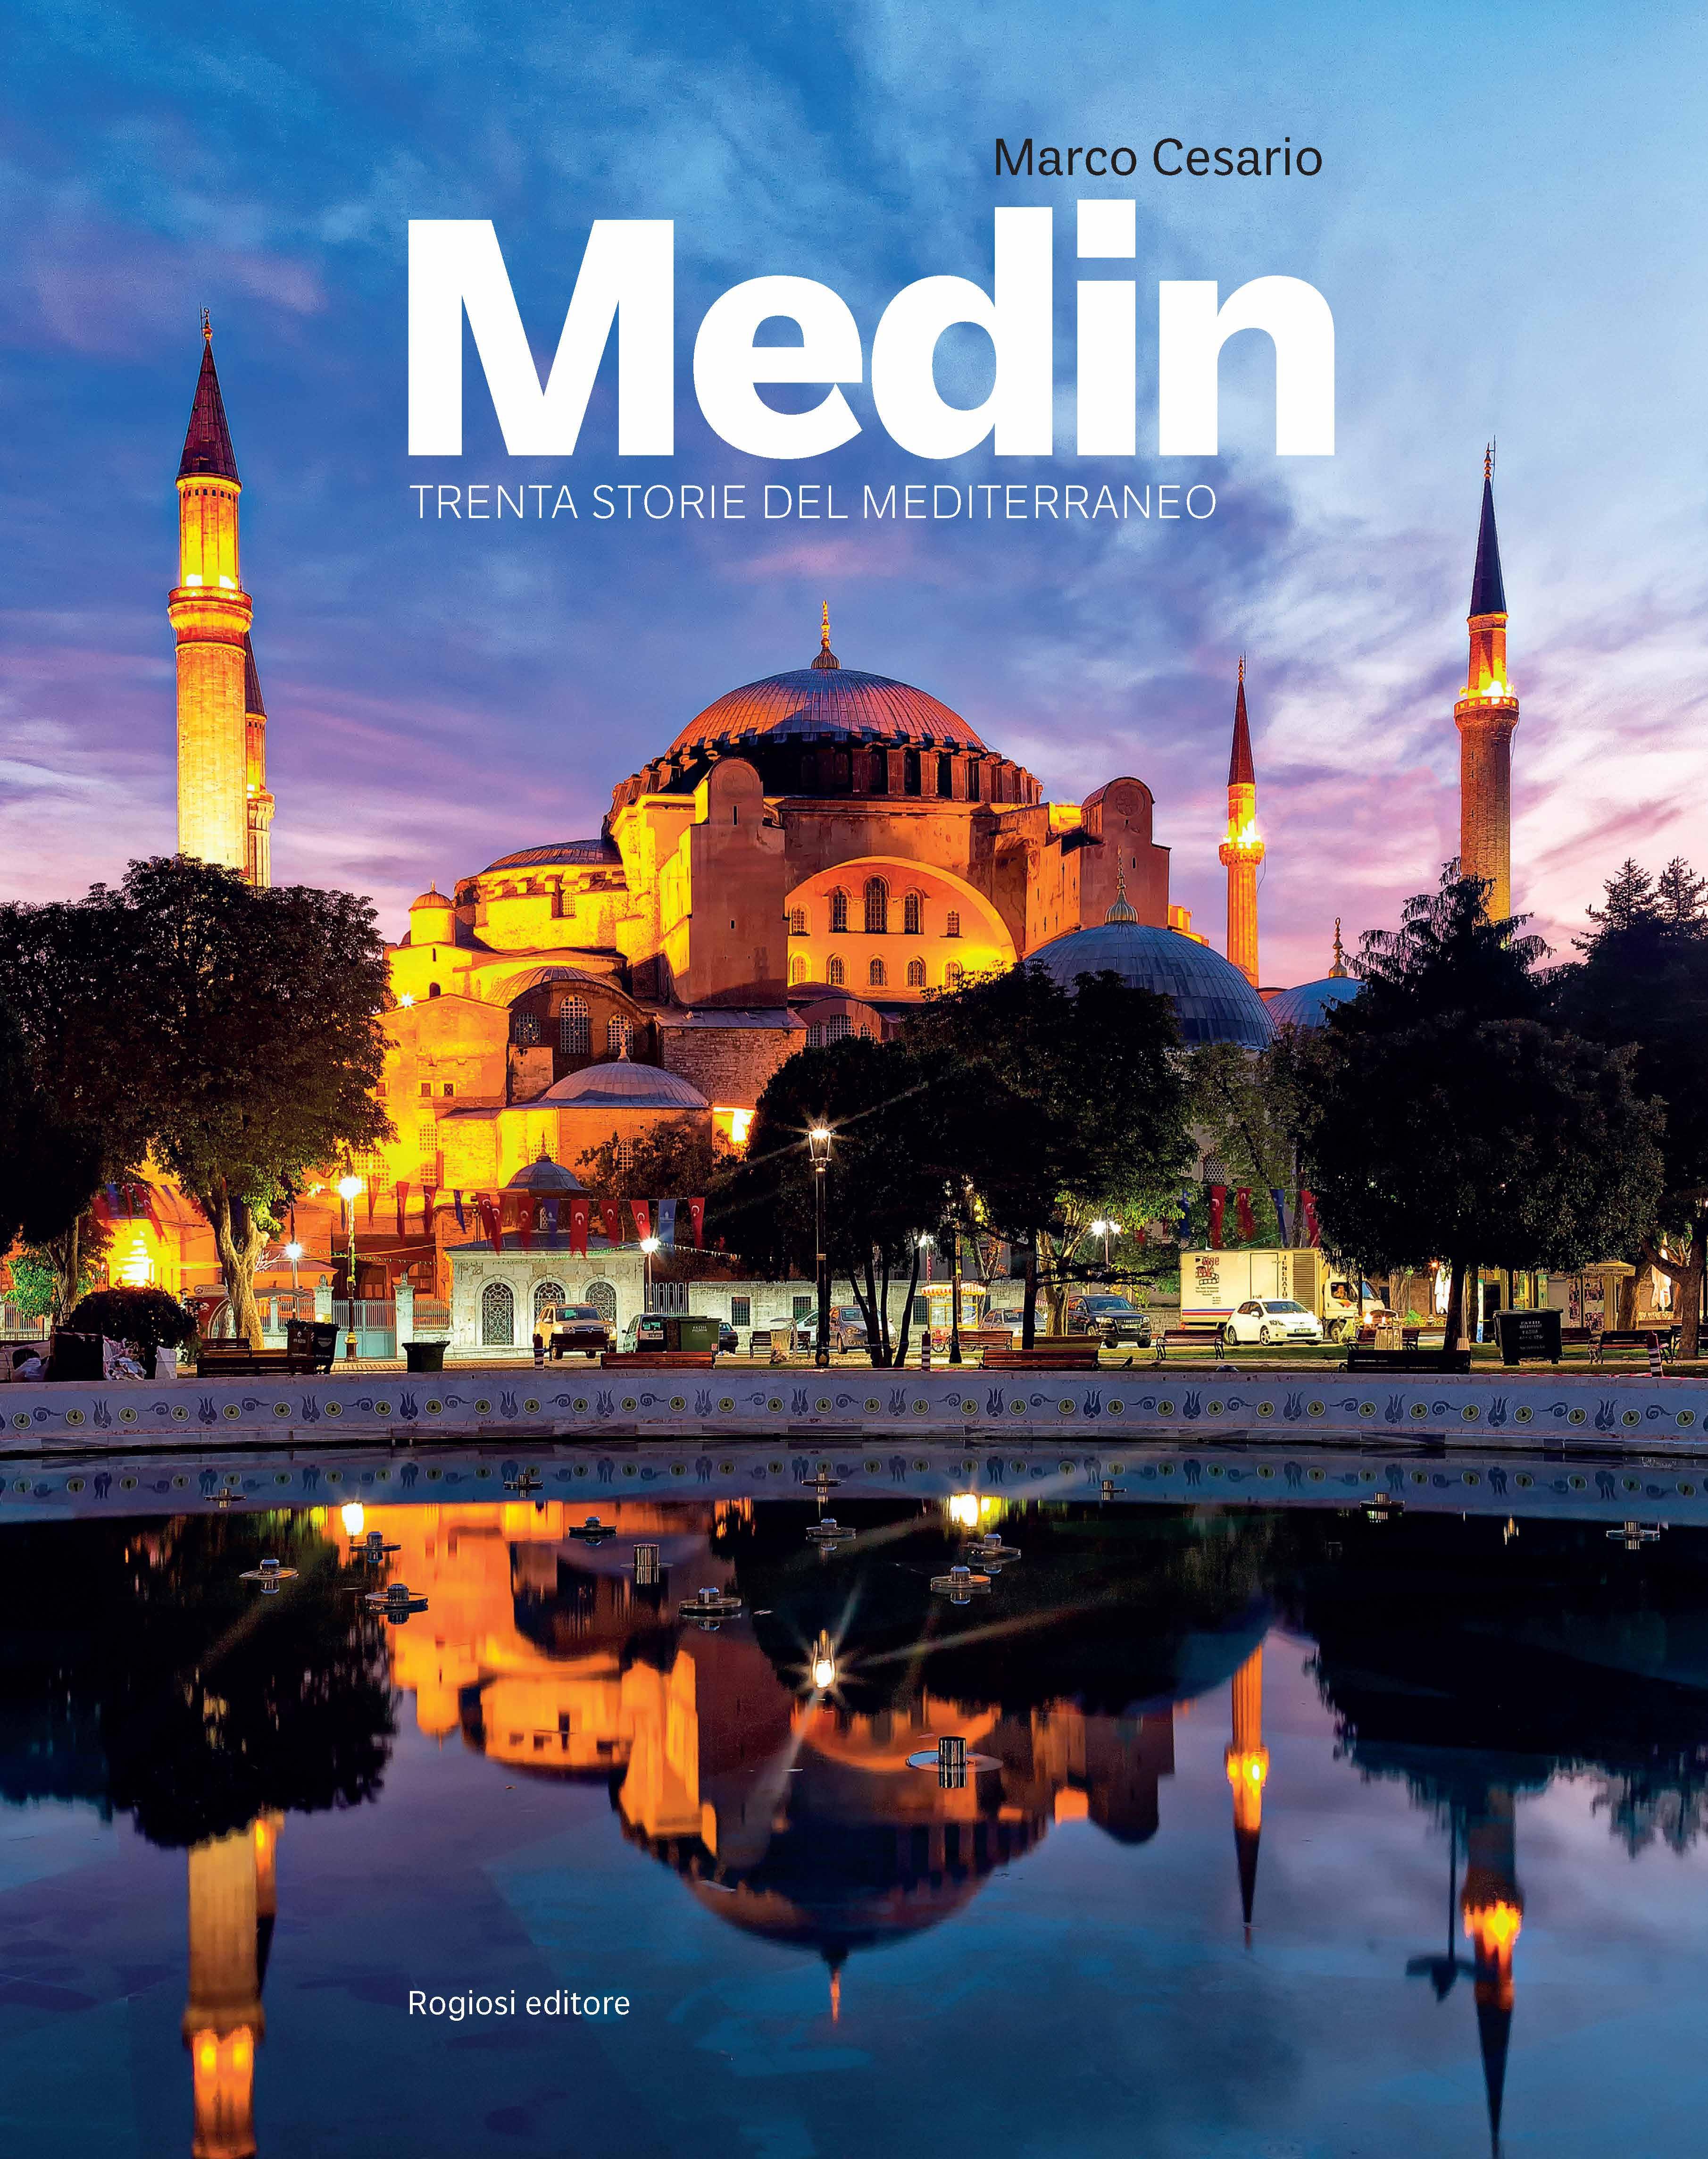 MEDIN - trenta storie del mediterraneo